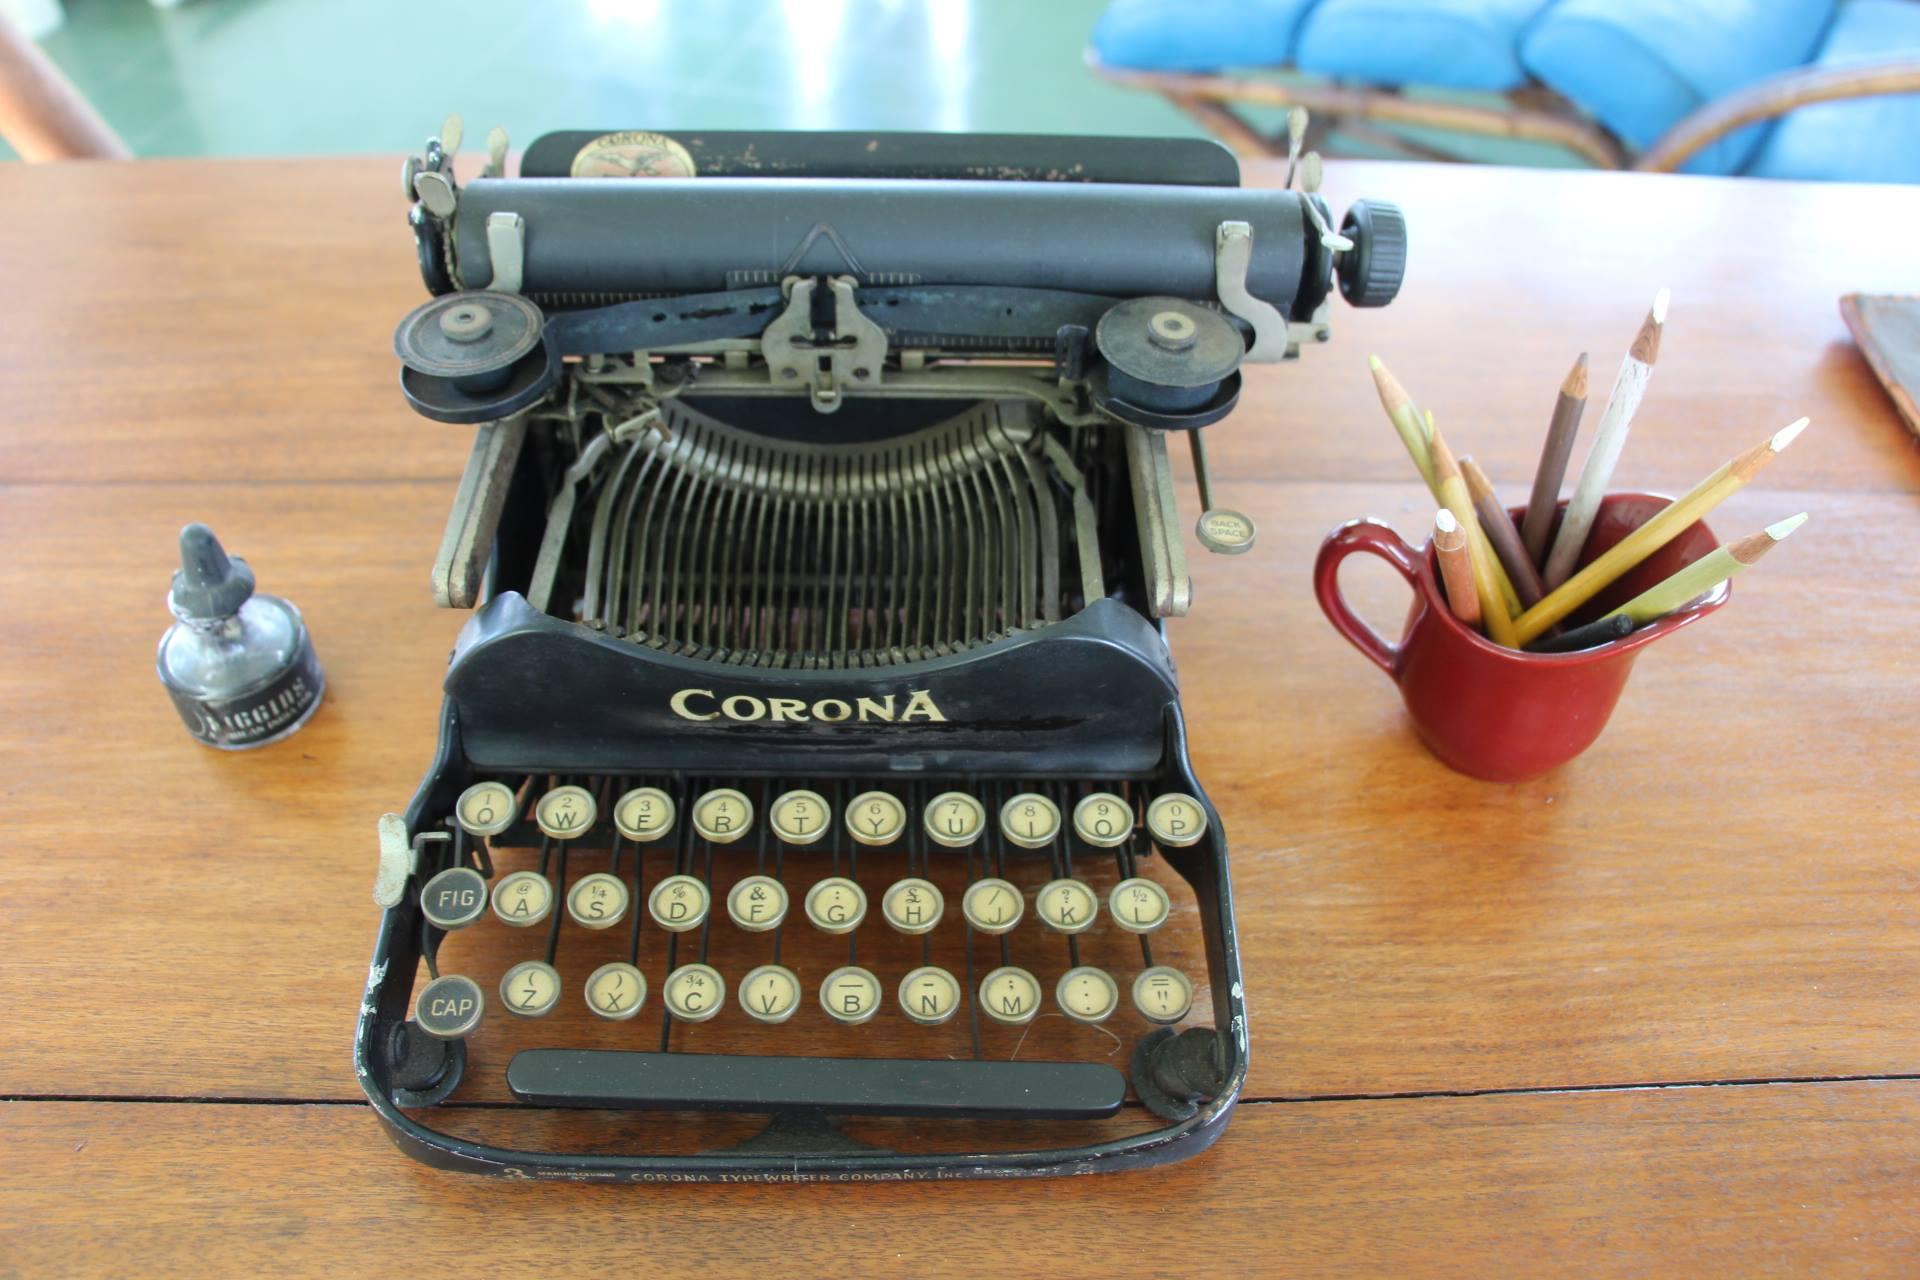 And this is Hemingway's typewriter...